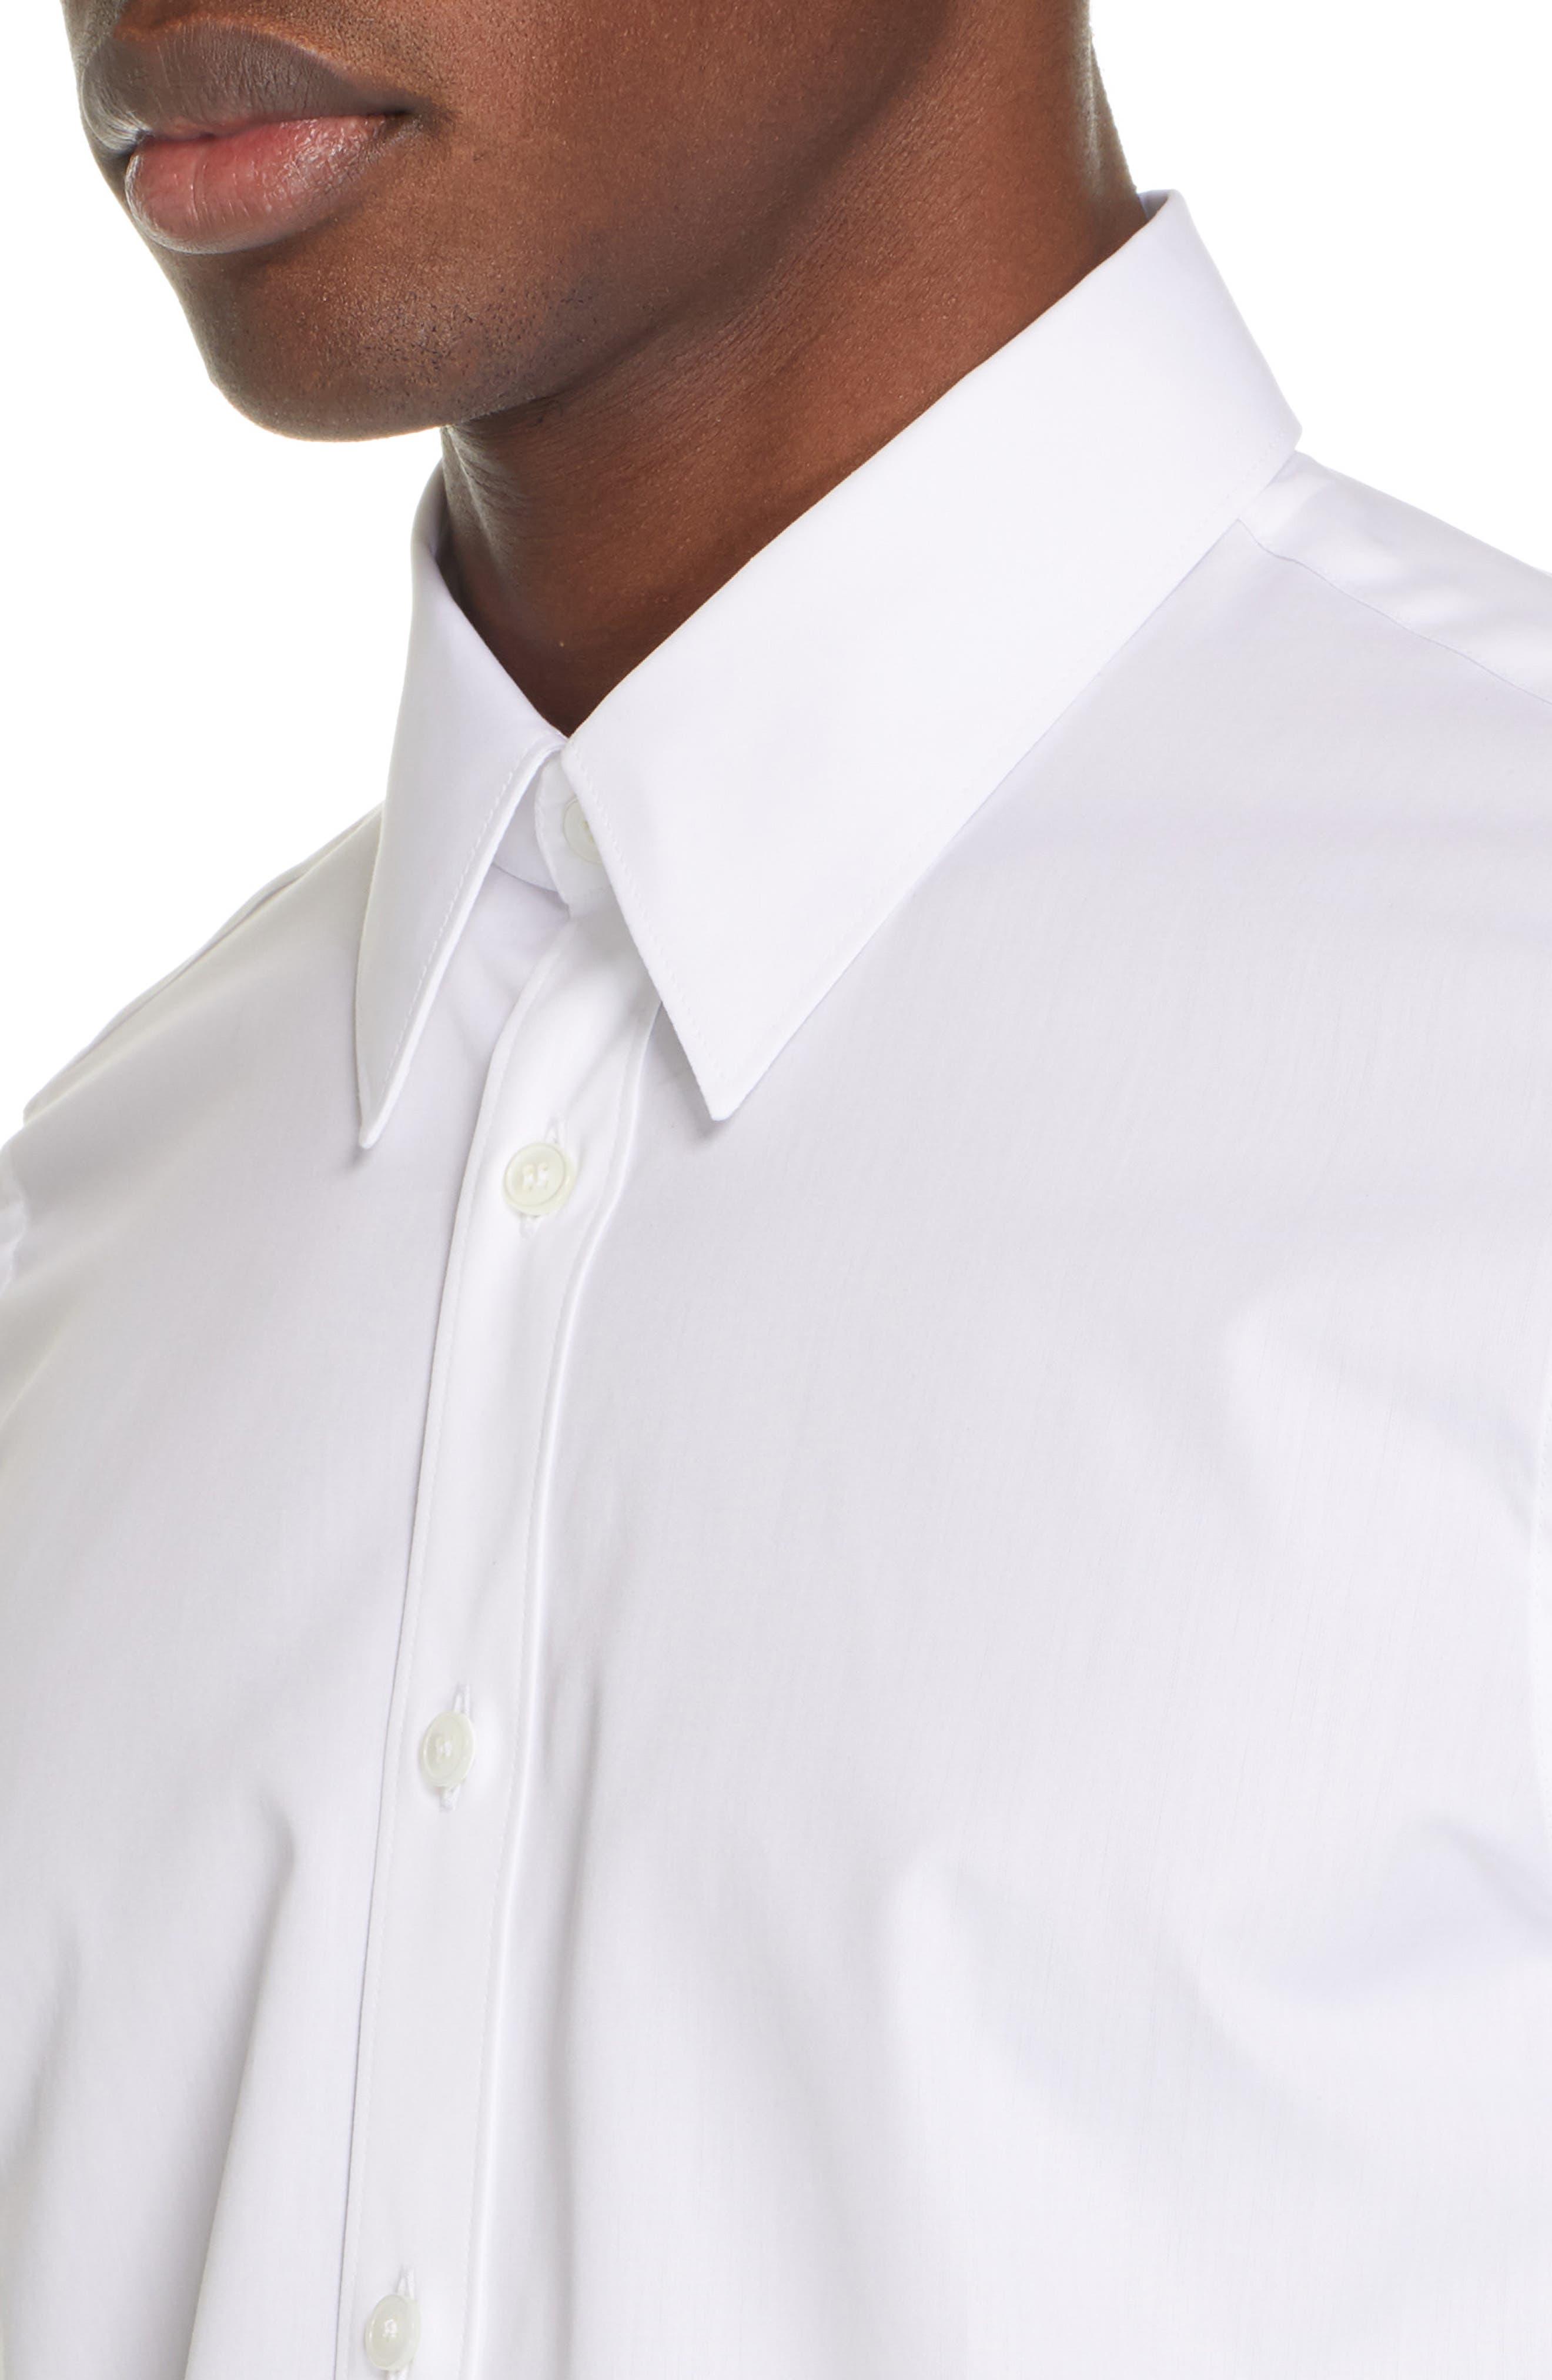 HELMUT LANG, Logo Back Long Sleeve Woven Shirt, Alternate thumbnail 2, color, WHITE AND BLACK